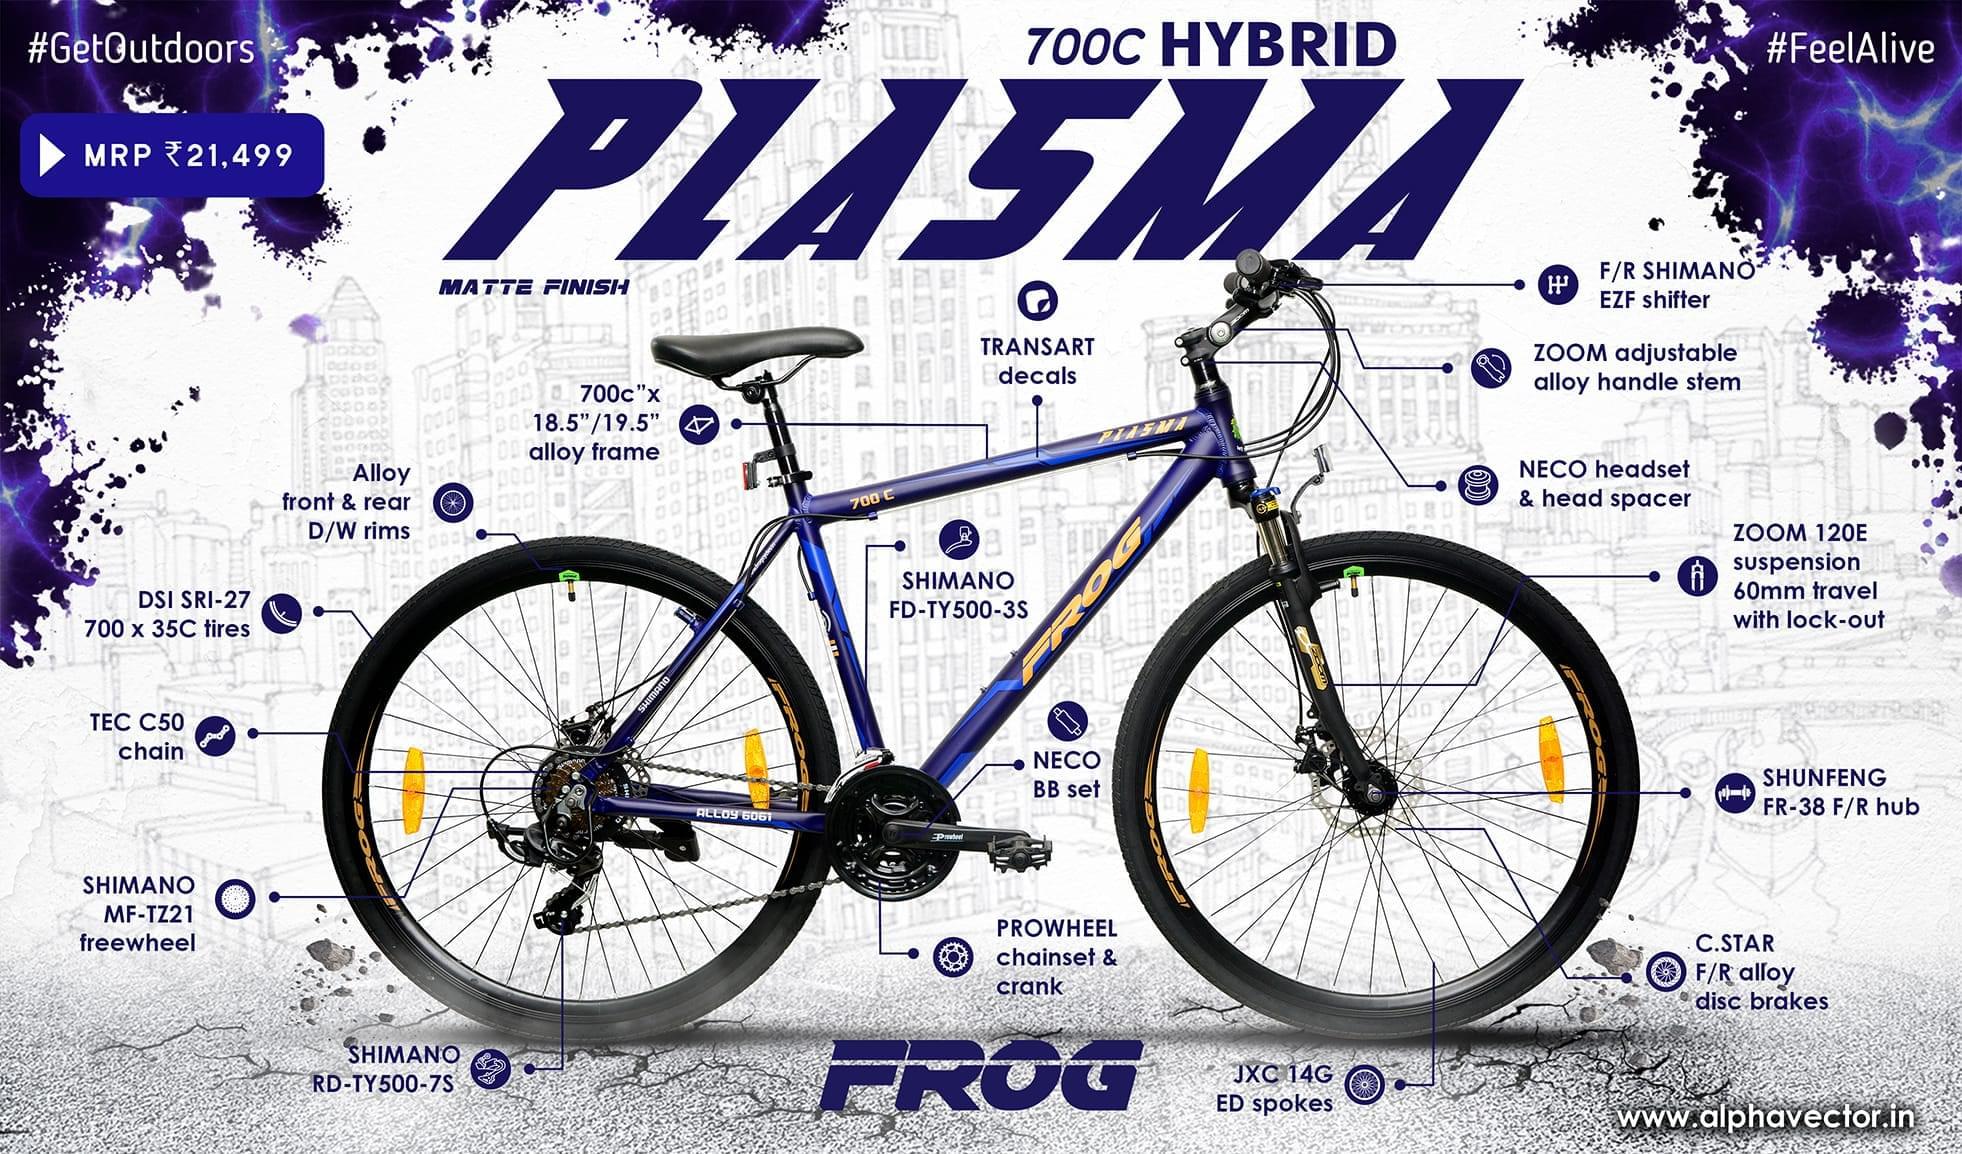 Plasma 700C Violet (18.5